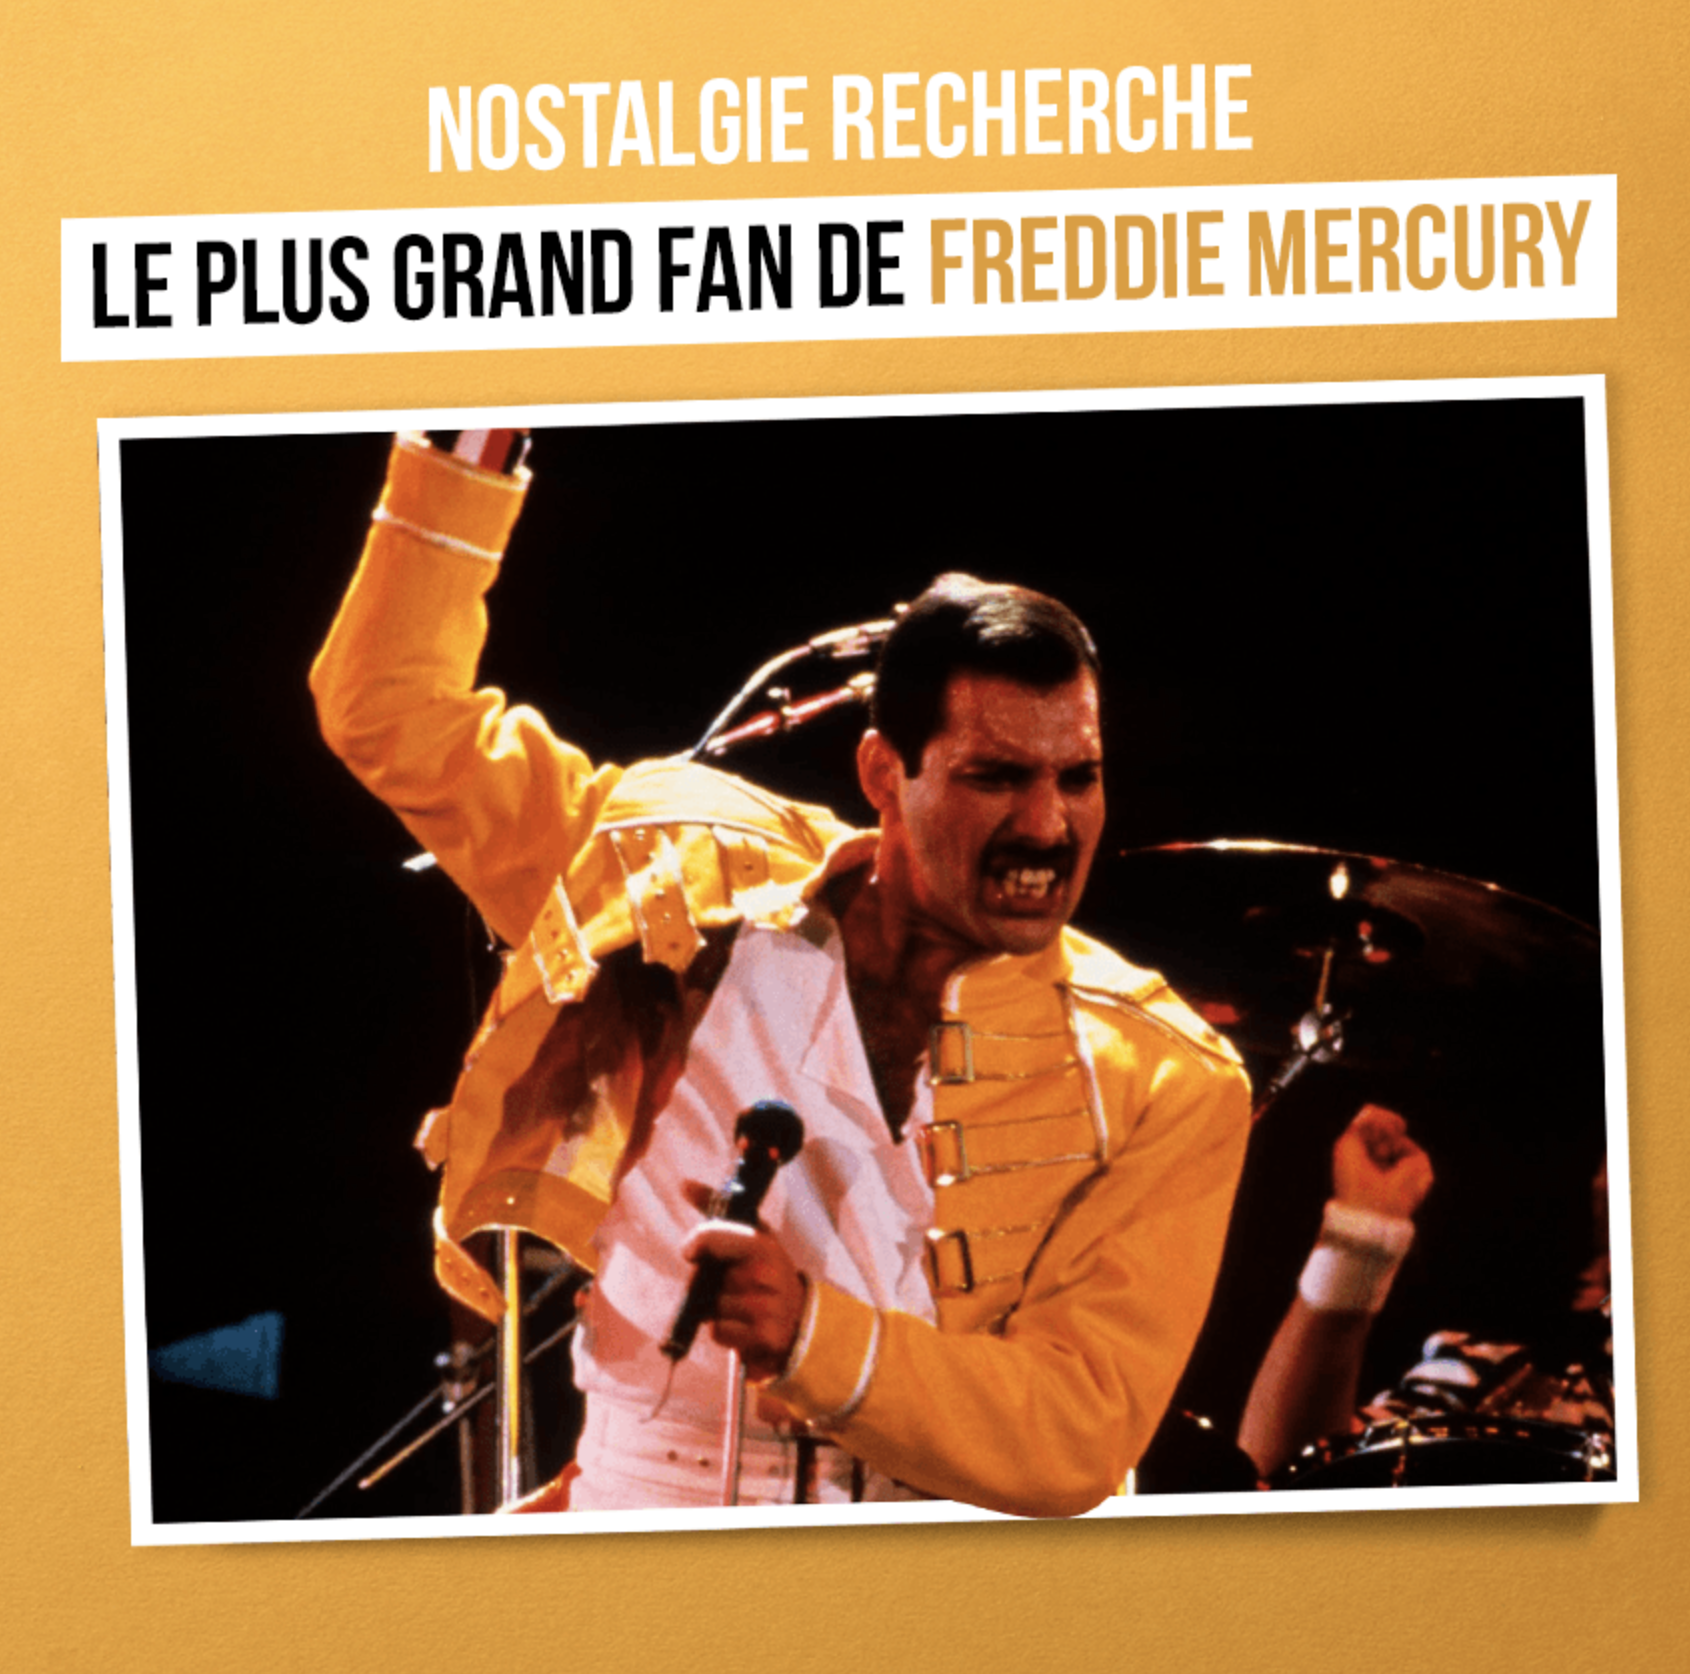 Nostalgie recherche le plus grand fan de Freddie Mercury